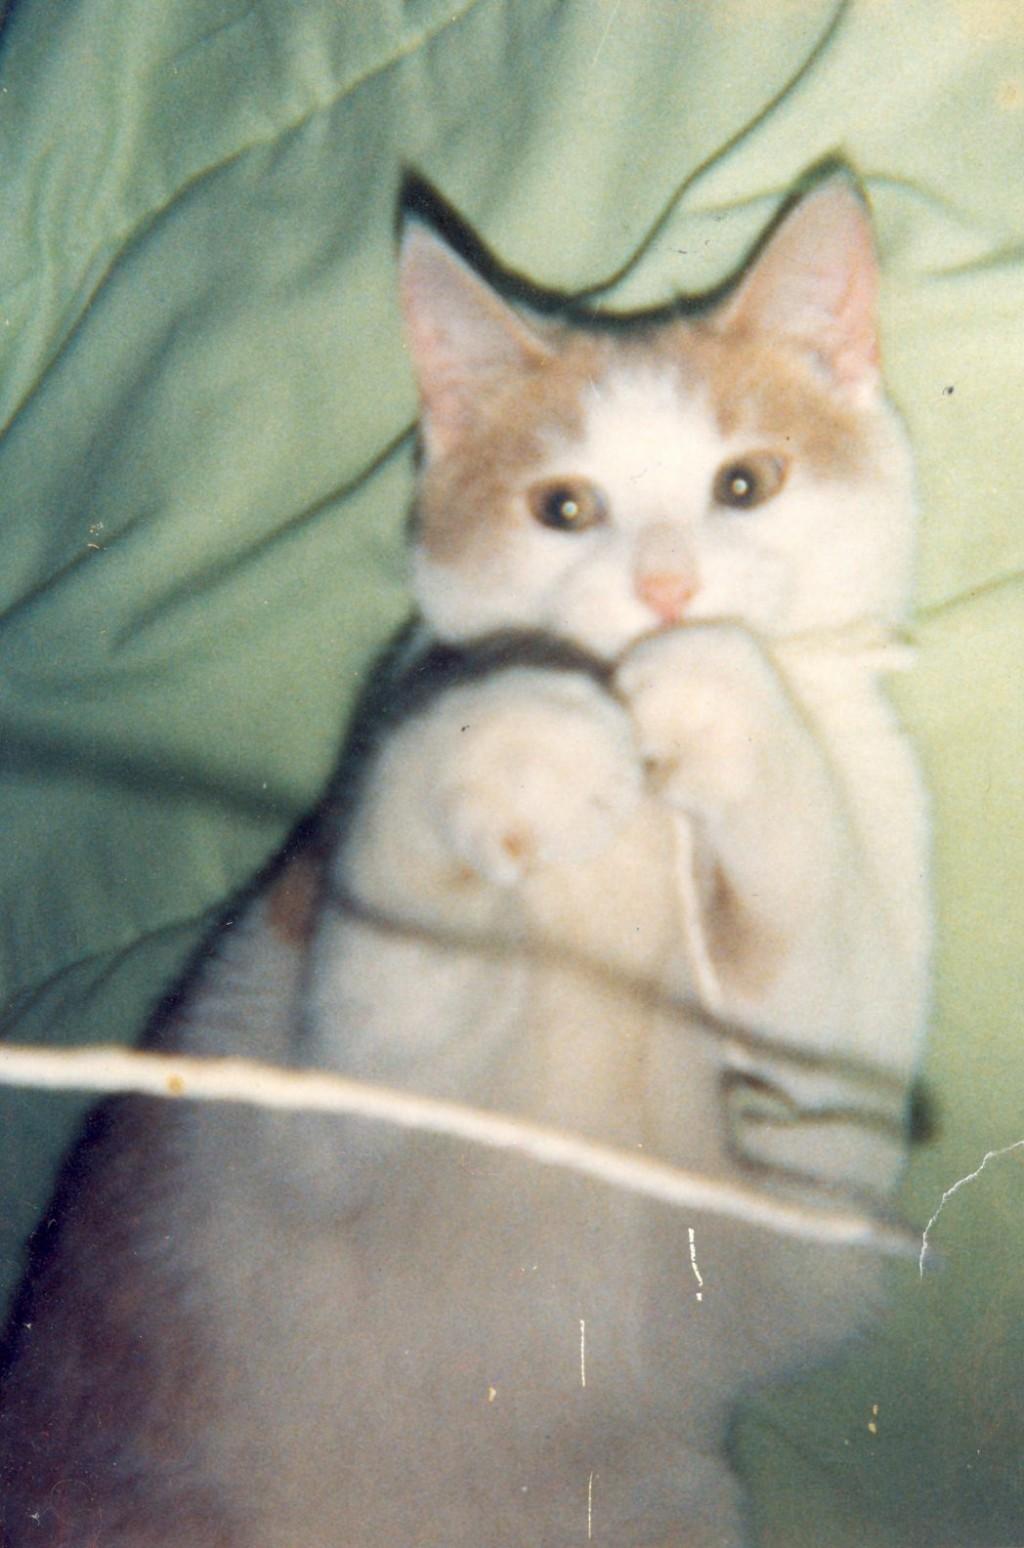 019 Pet Animal Cat Essay Example The Rintrah Upon Patrick J Keane Num Eacute Ro Writing Sca Topics Vine In Hindi My Dreaded Favorite English Tamil Large